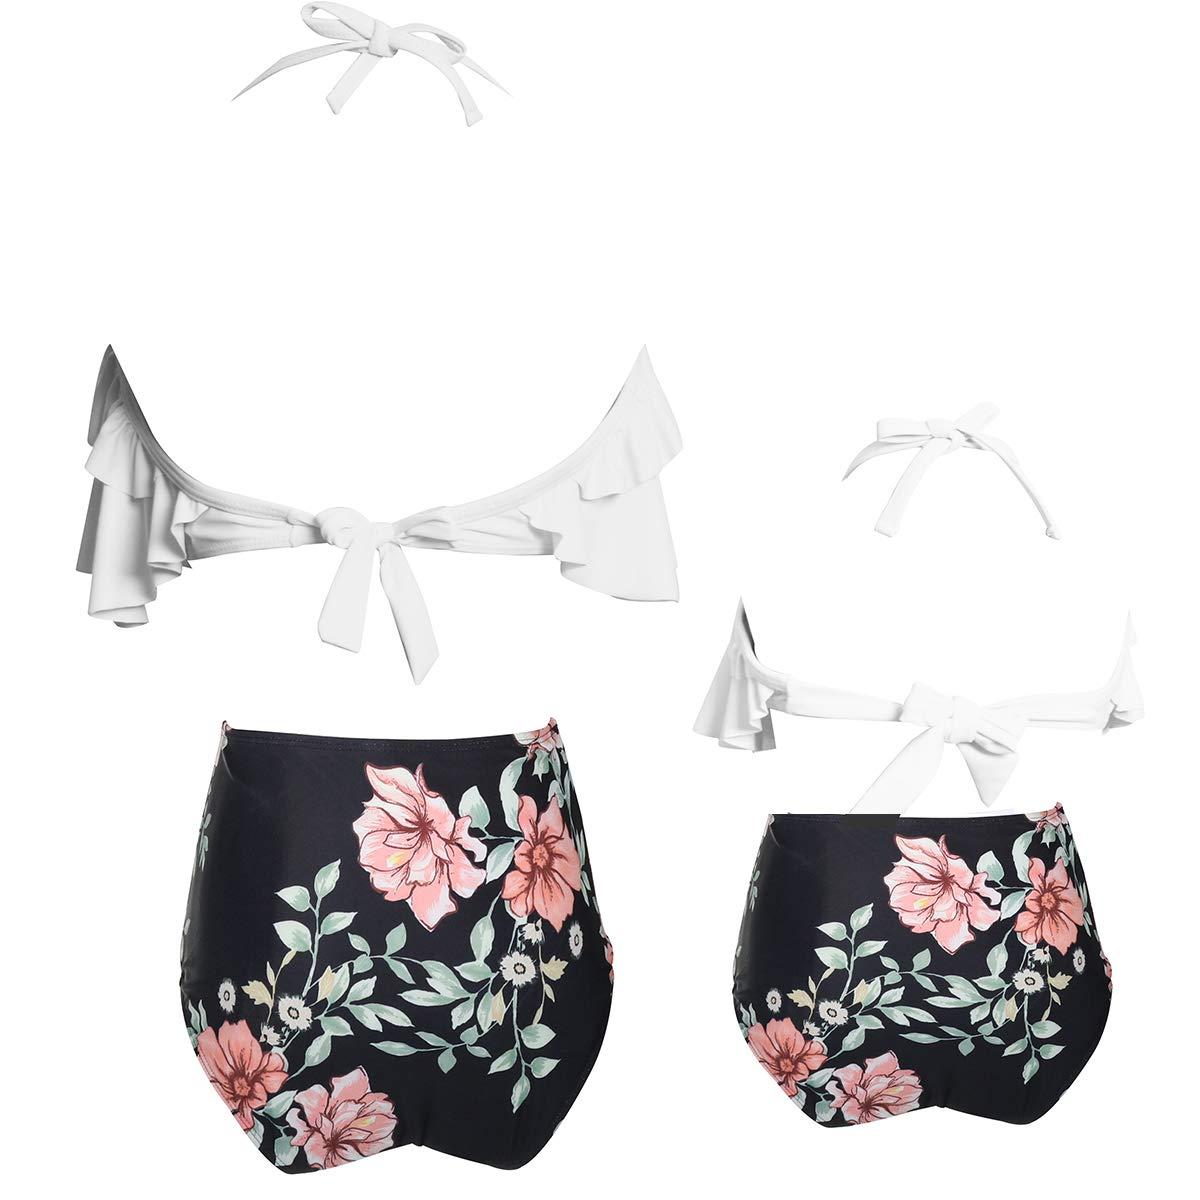 2 Piezas Bikini Conjuntos de Cintura Alta con Volantes de la impresi/ón de la Flor Trajes de ba/ño Ropa de la Familia Madre Trajes de la Hija